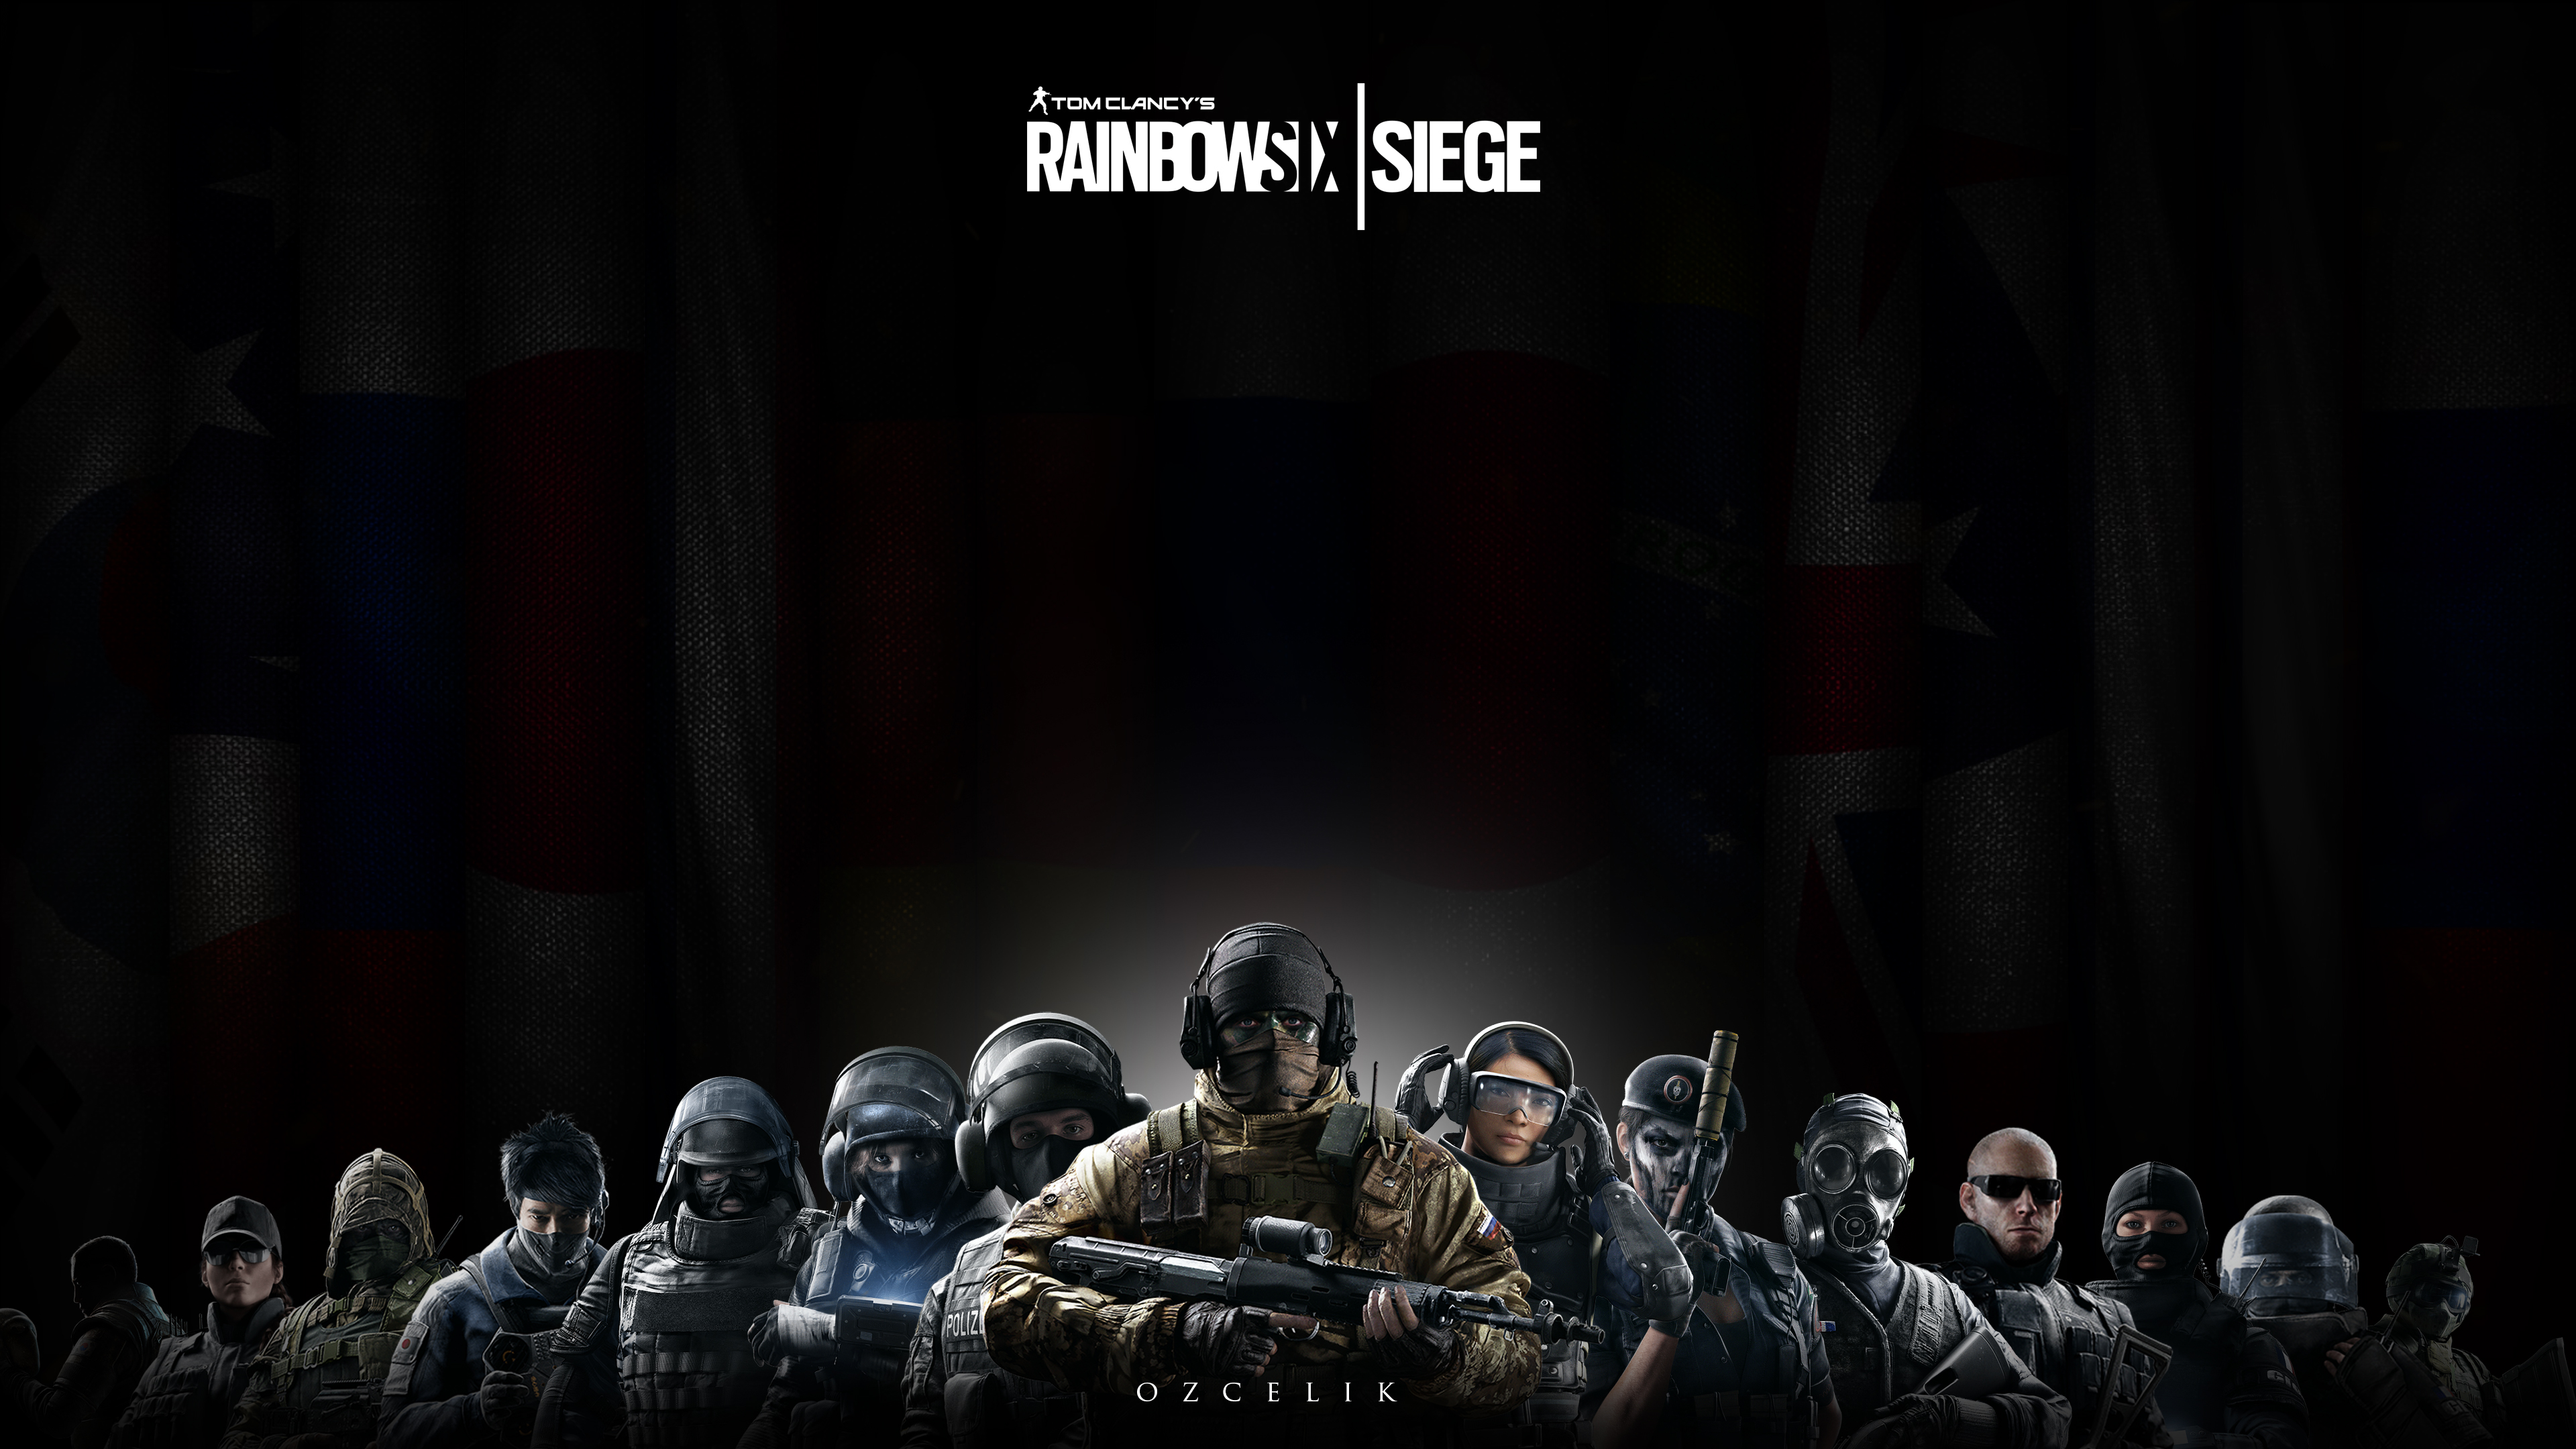 Rainbow Six Siege Wallpaper By Tunaozcelik On Deviantart